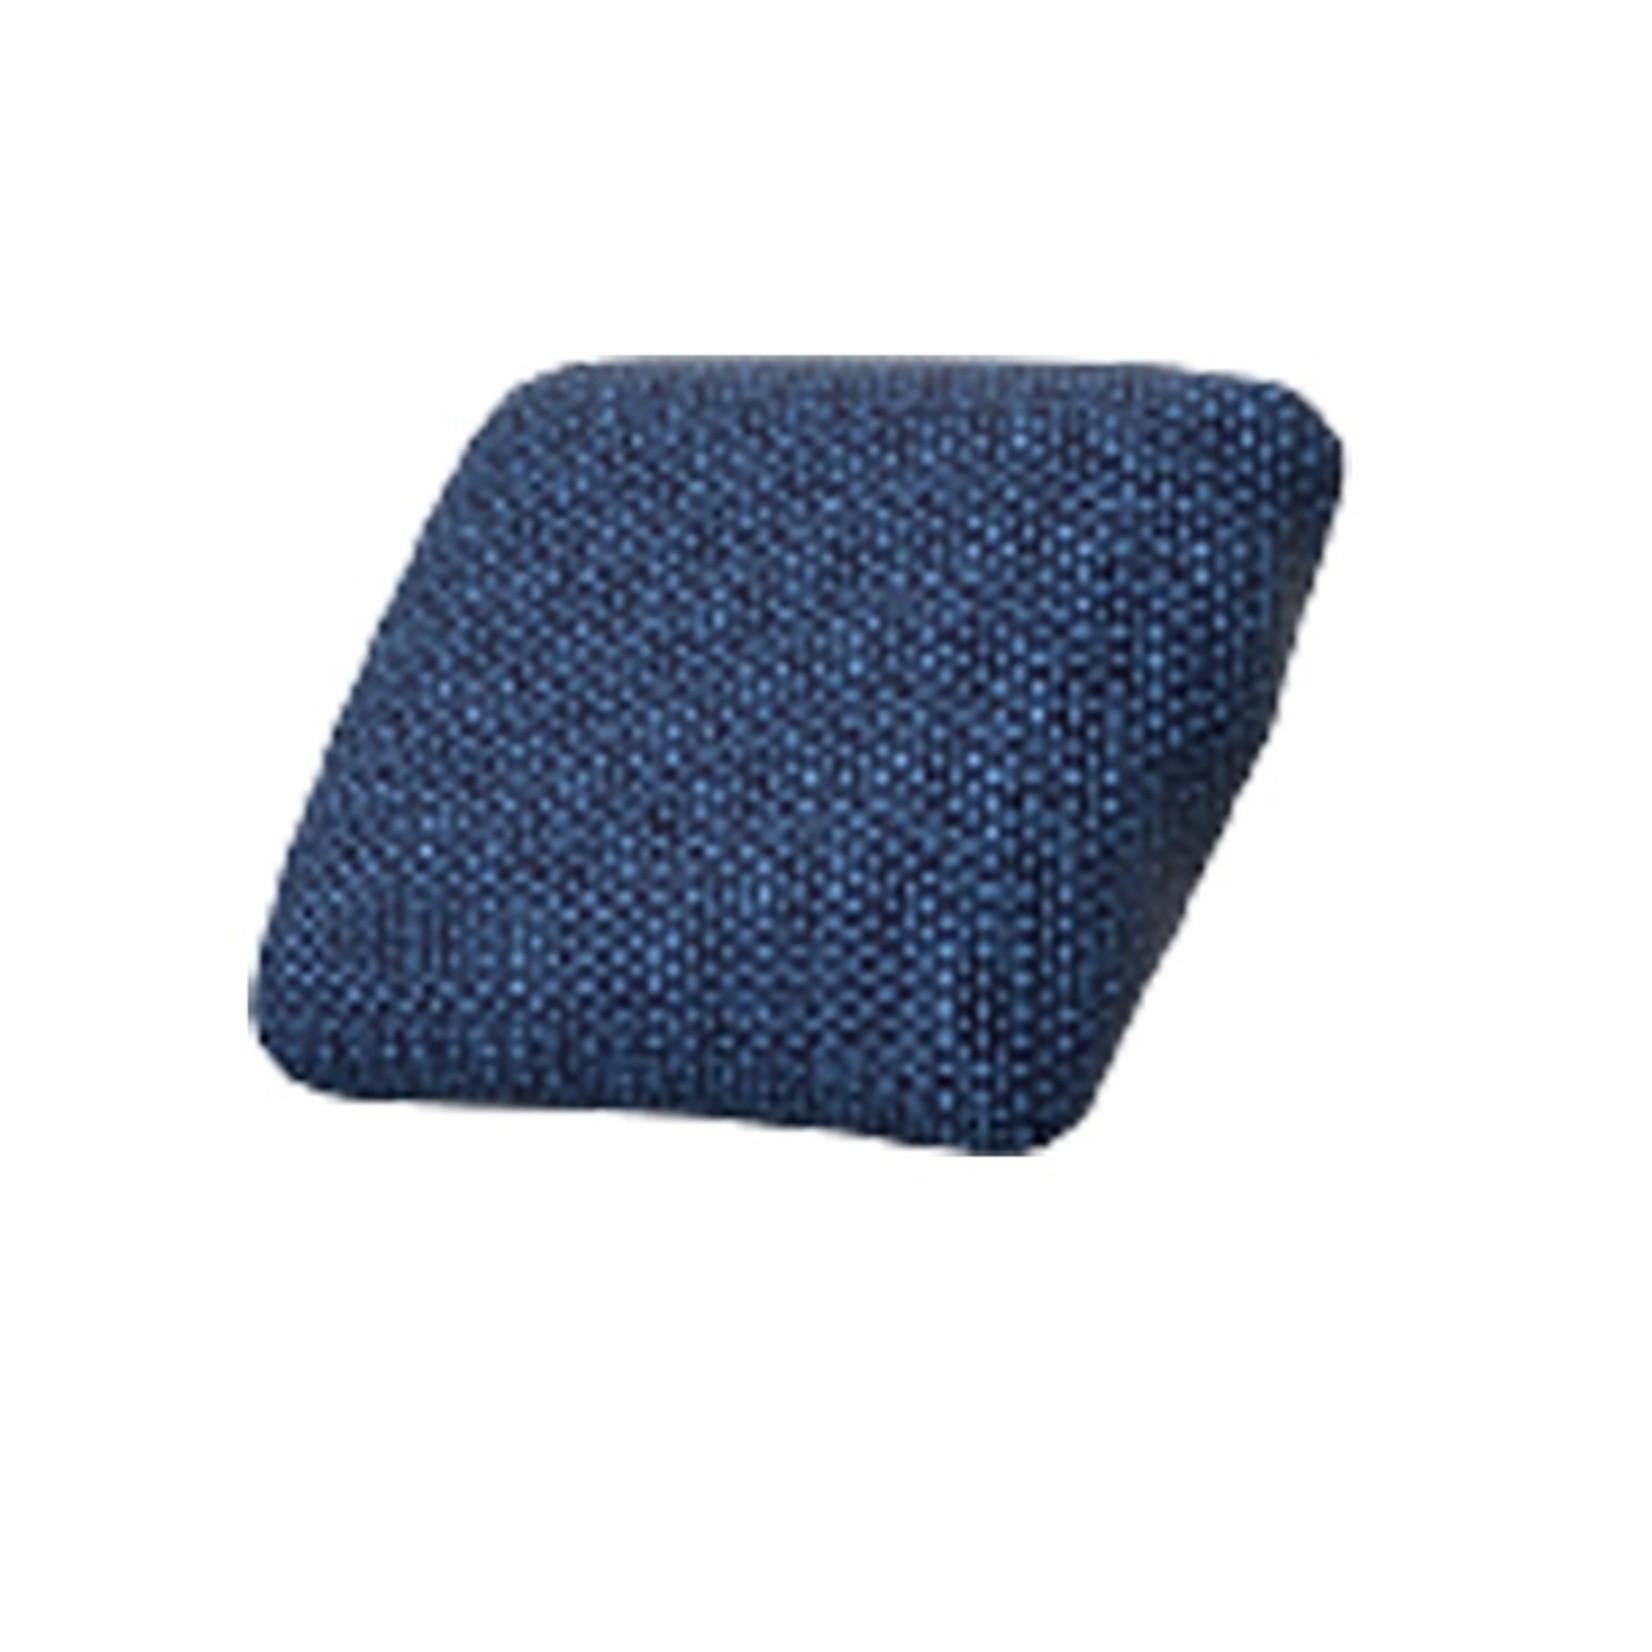 Vondom Suave Cushion 50x35